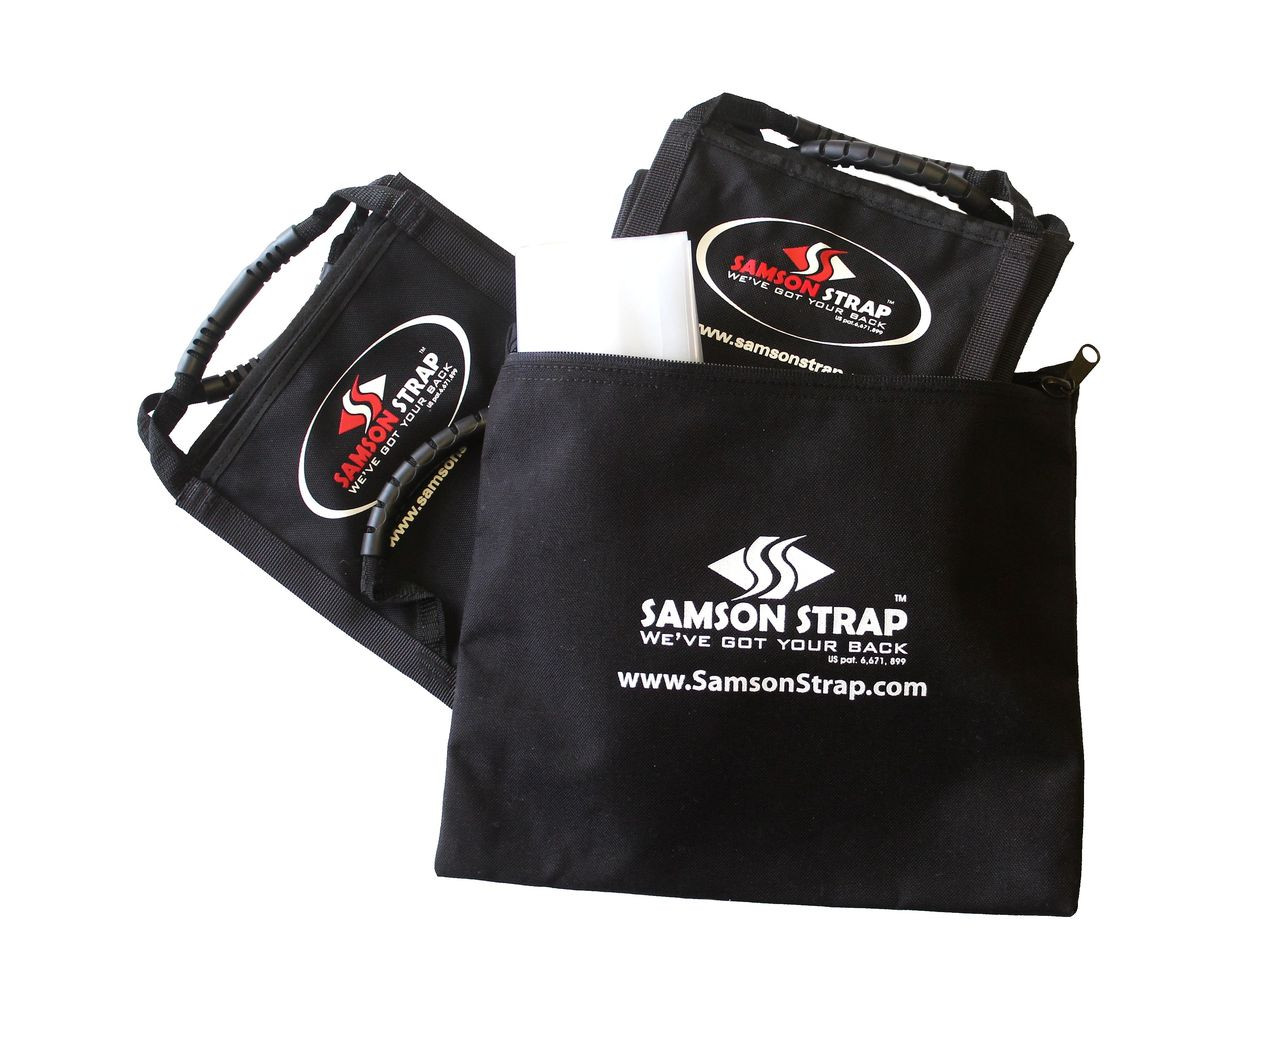 Samson Lift-Assist Straps - EMS Set